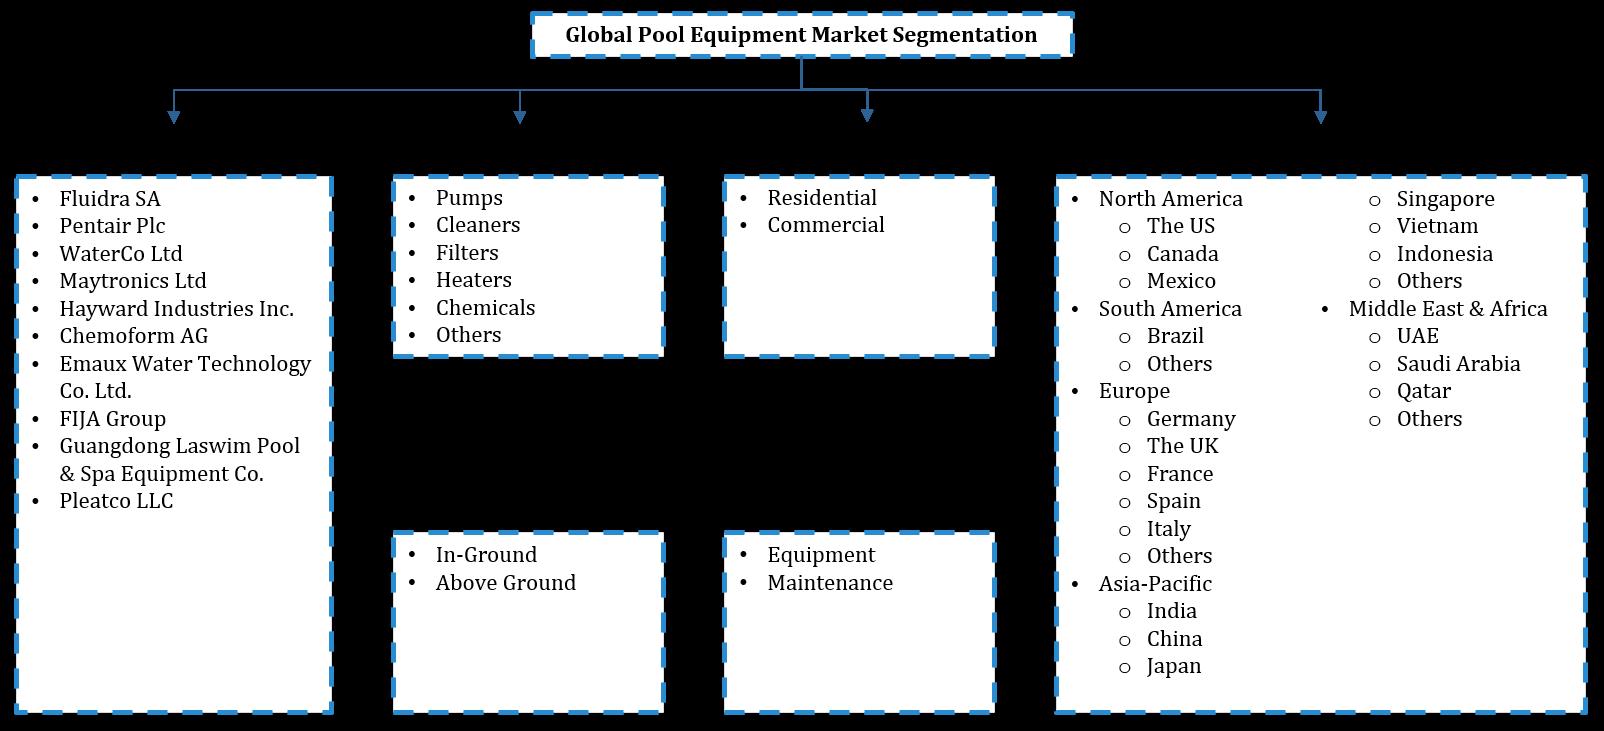 Global Pool Equipment Market Segmentation